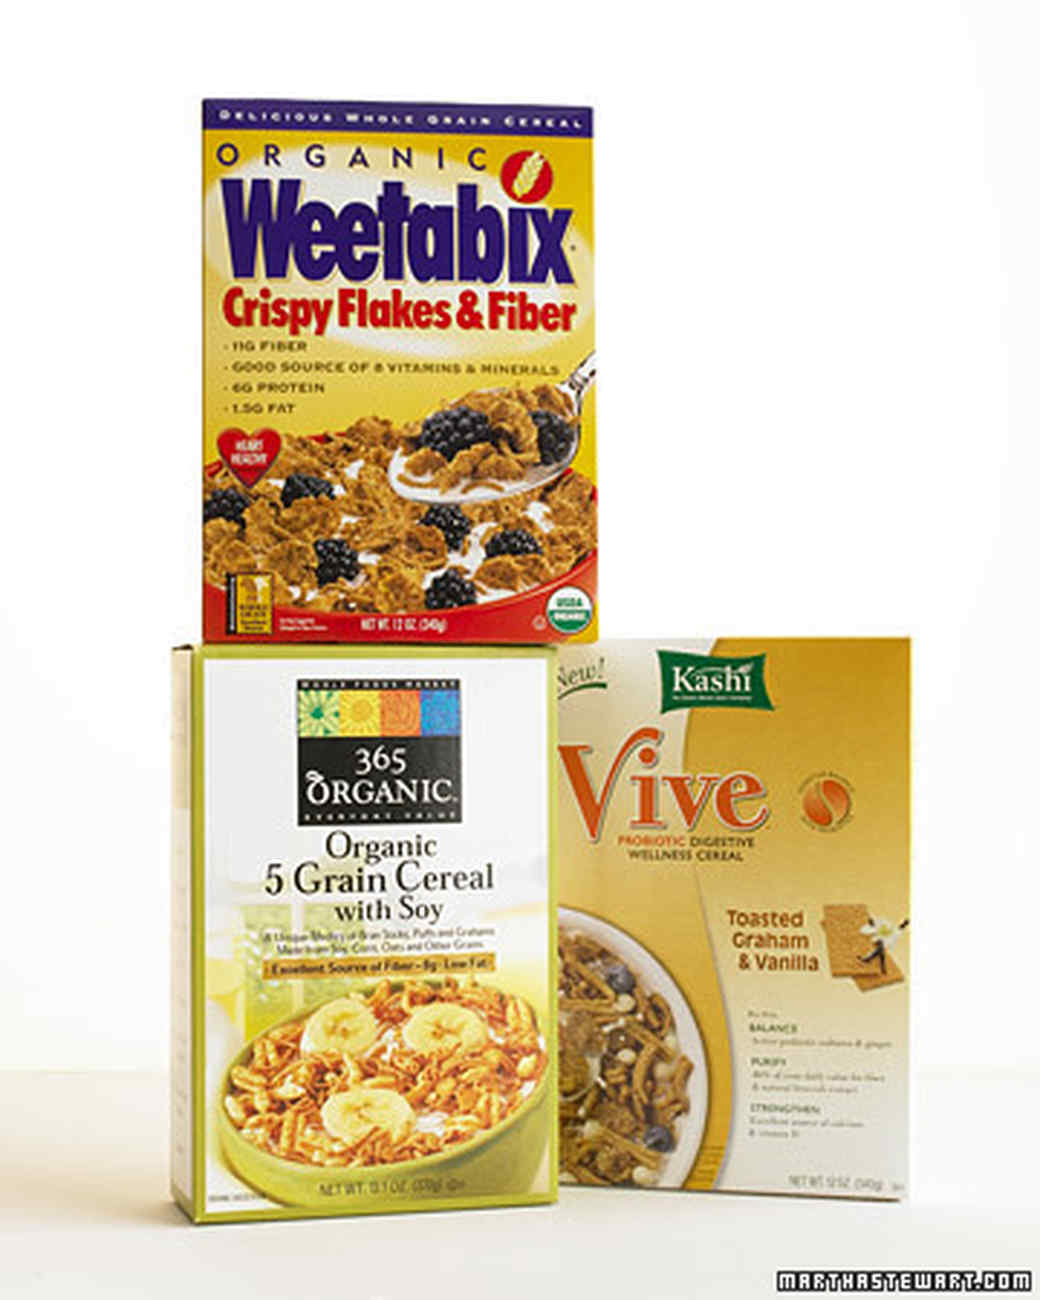 ba103265_1007_cereal.jpg